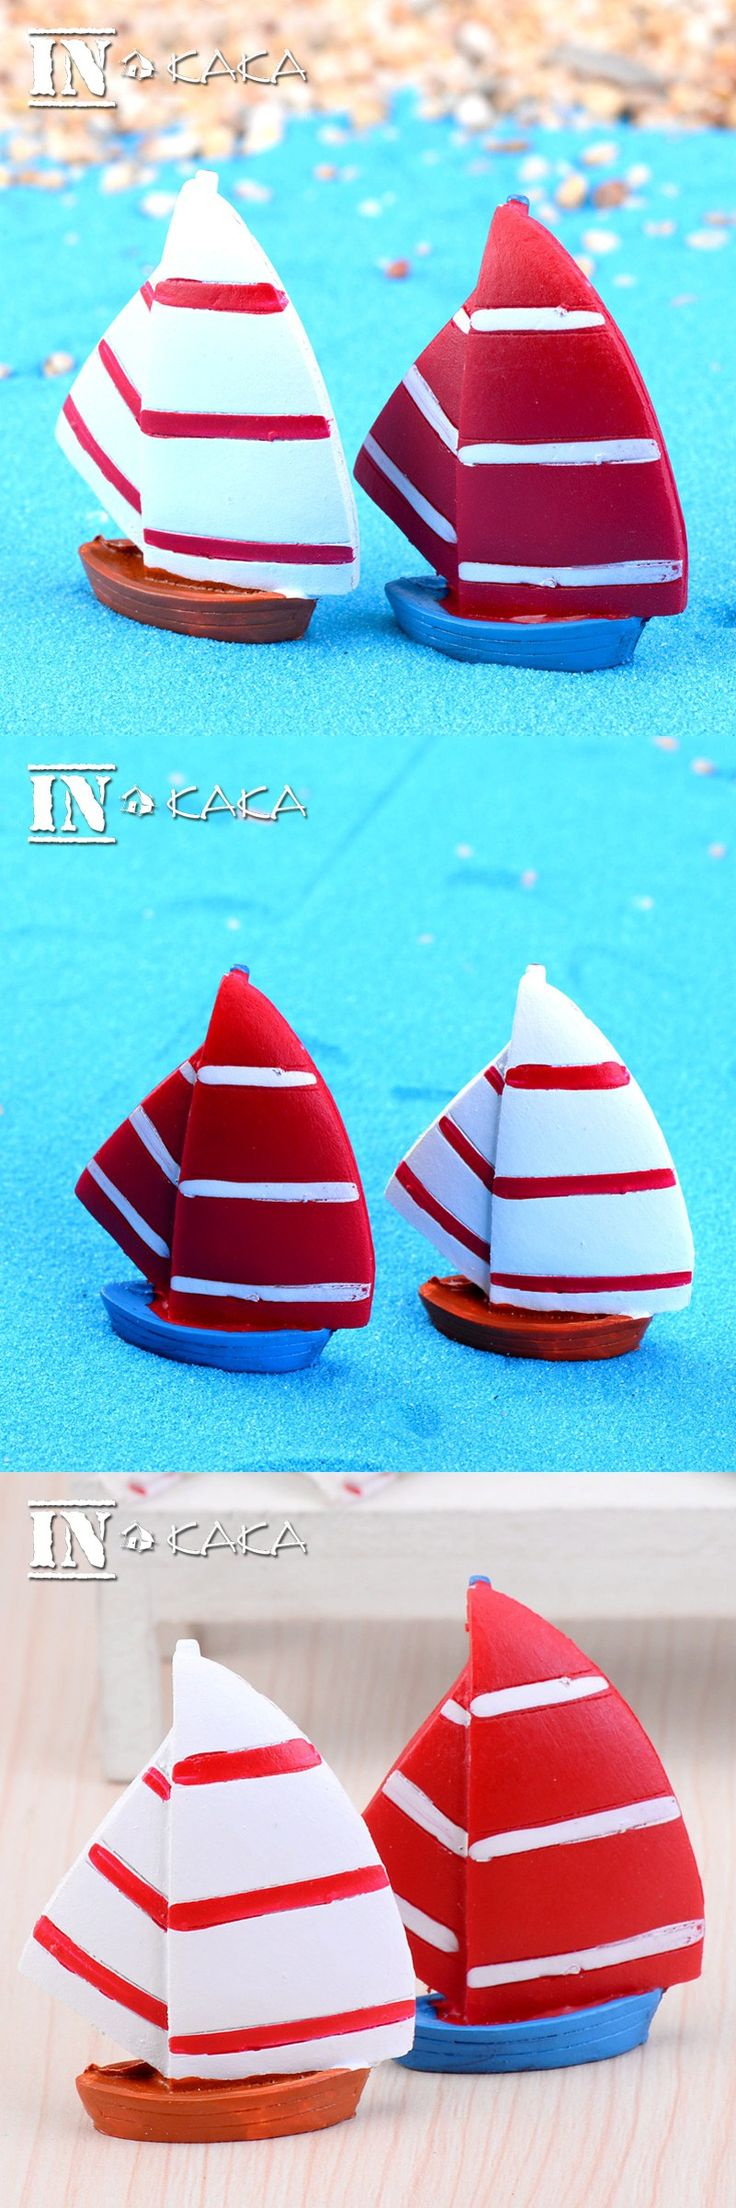 Mediterranean Home micro garden Decoration figurines resin crafts Sailboat boats model Toys aquariums/terrarium DIY accessories $1.48